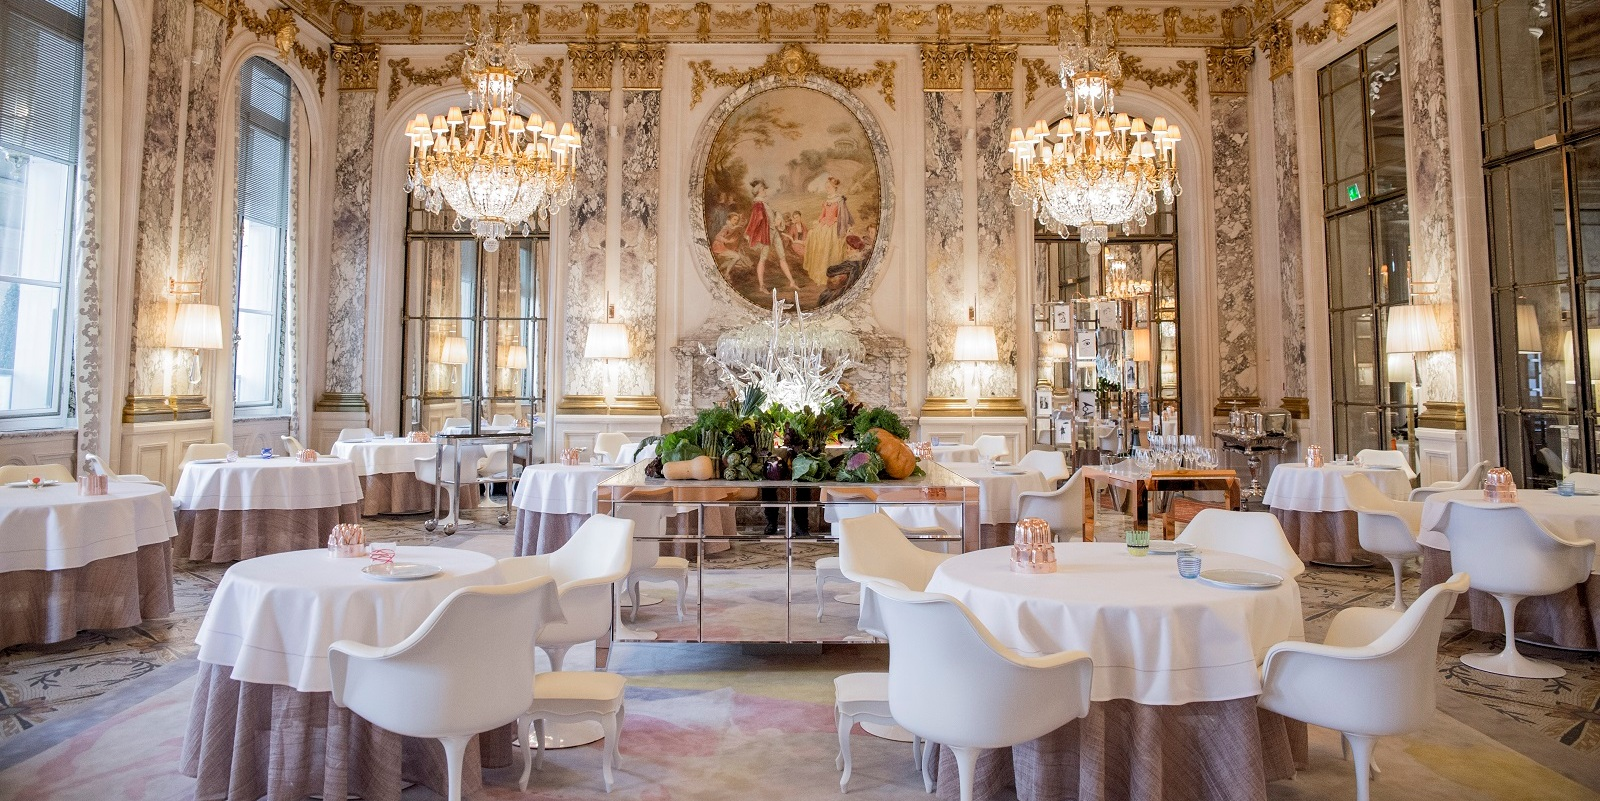 Most beautiful hotel restaurants, Le Meurice, Alain Ducasse